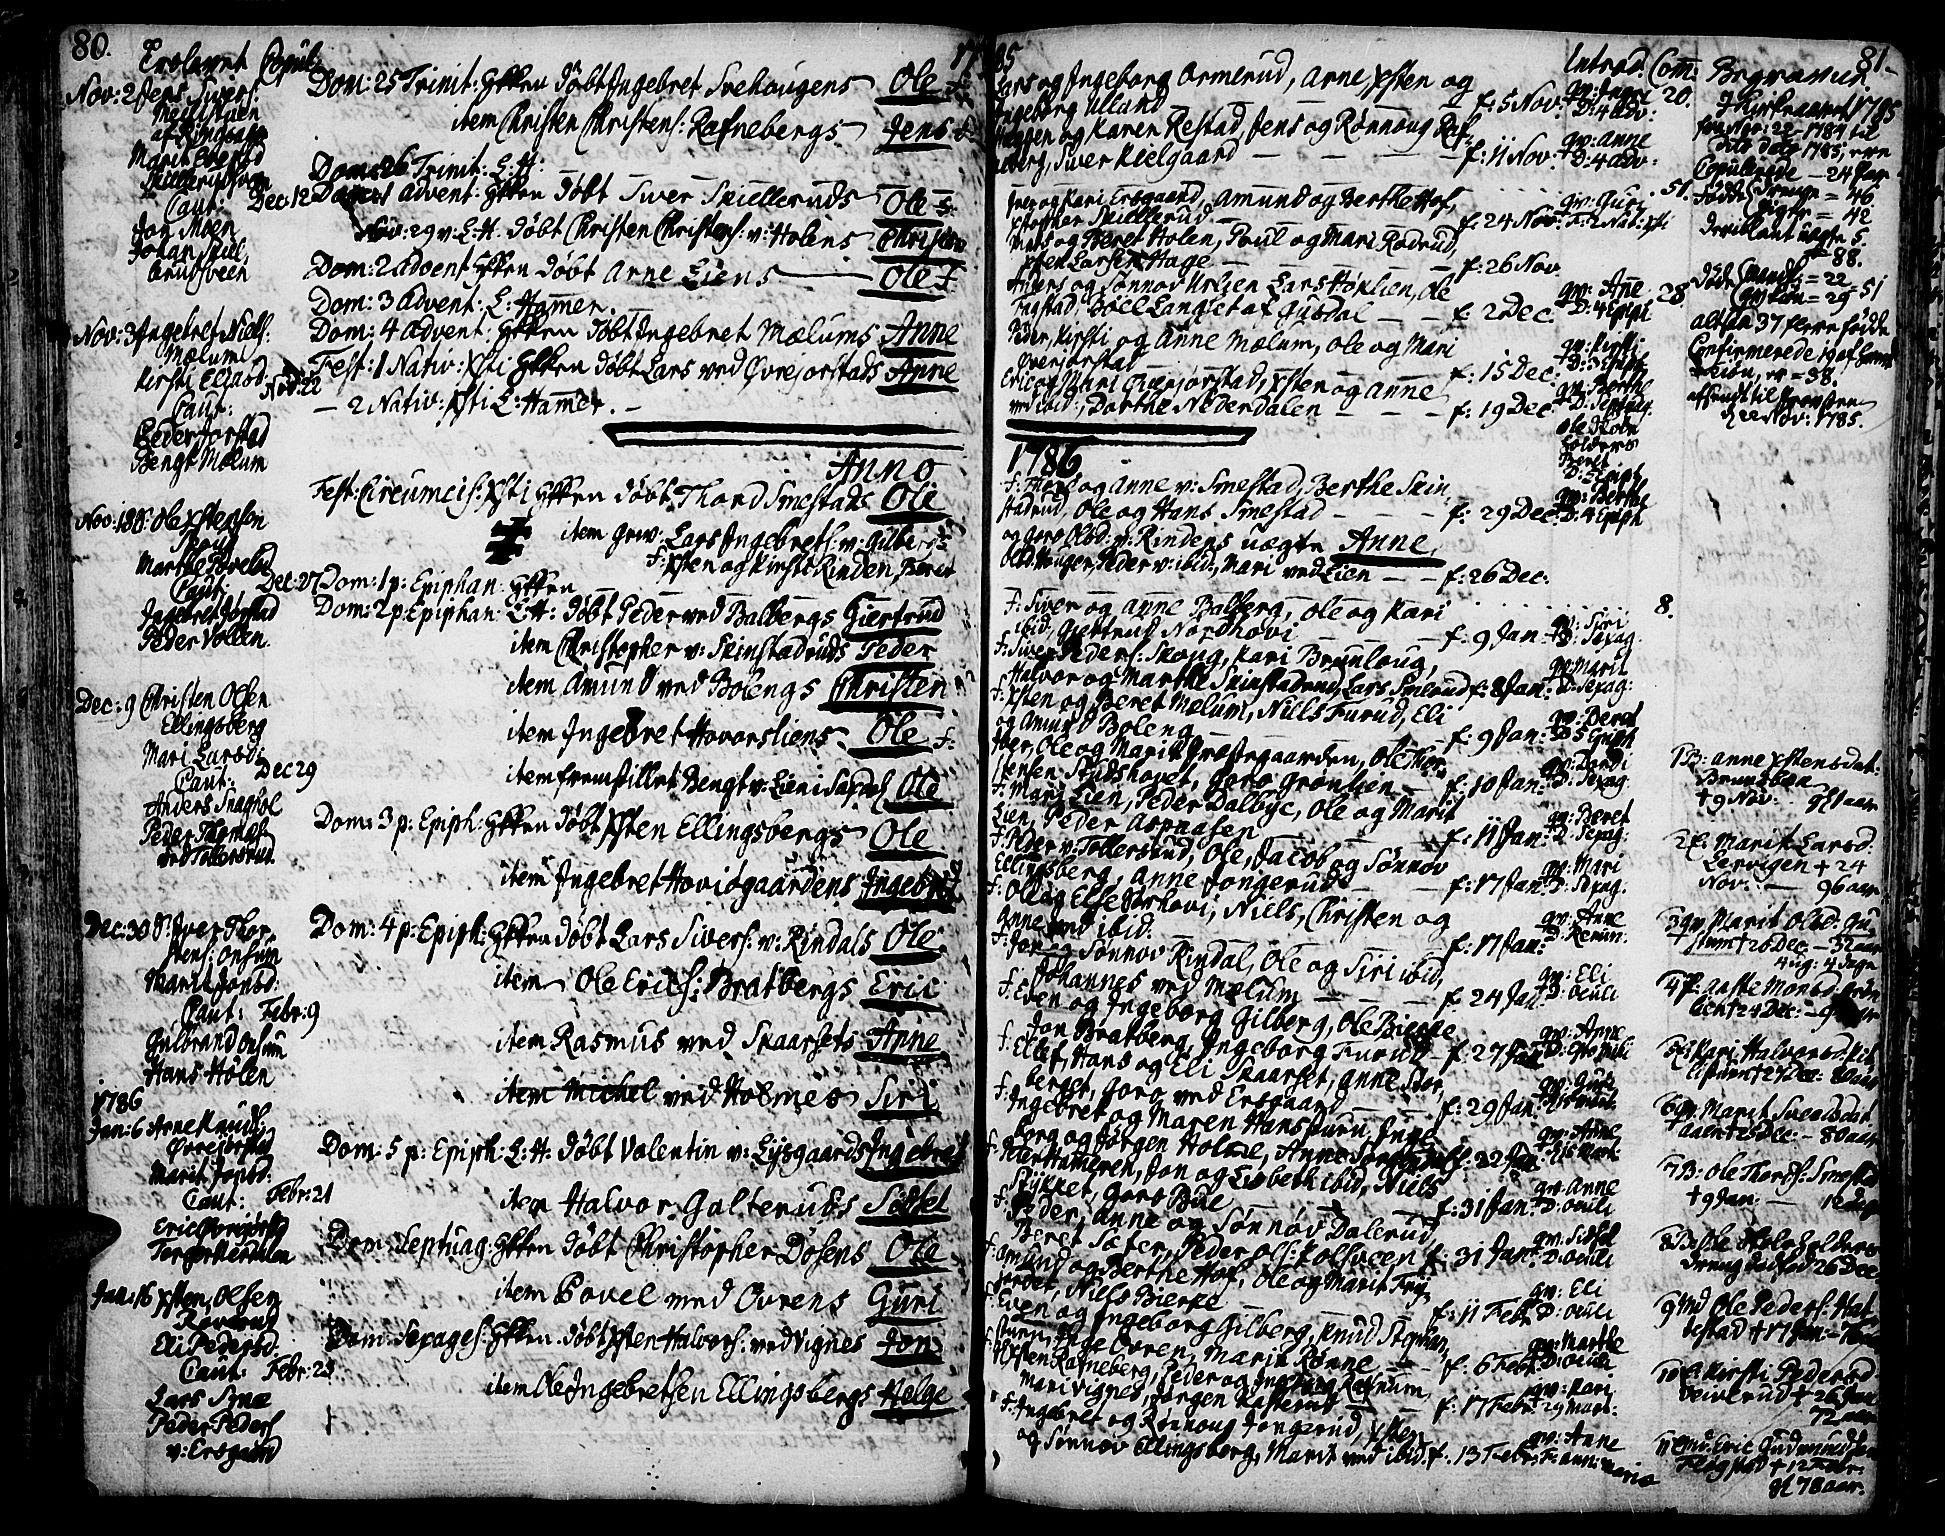 SAH, Fåberg prestekontor, Ministerialbok nr. 2, 1775-1818, s. 80-81